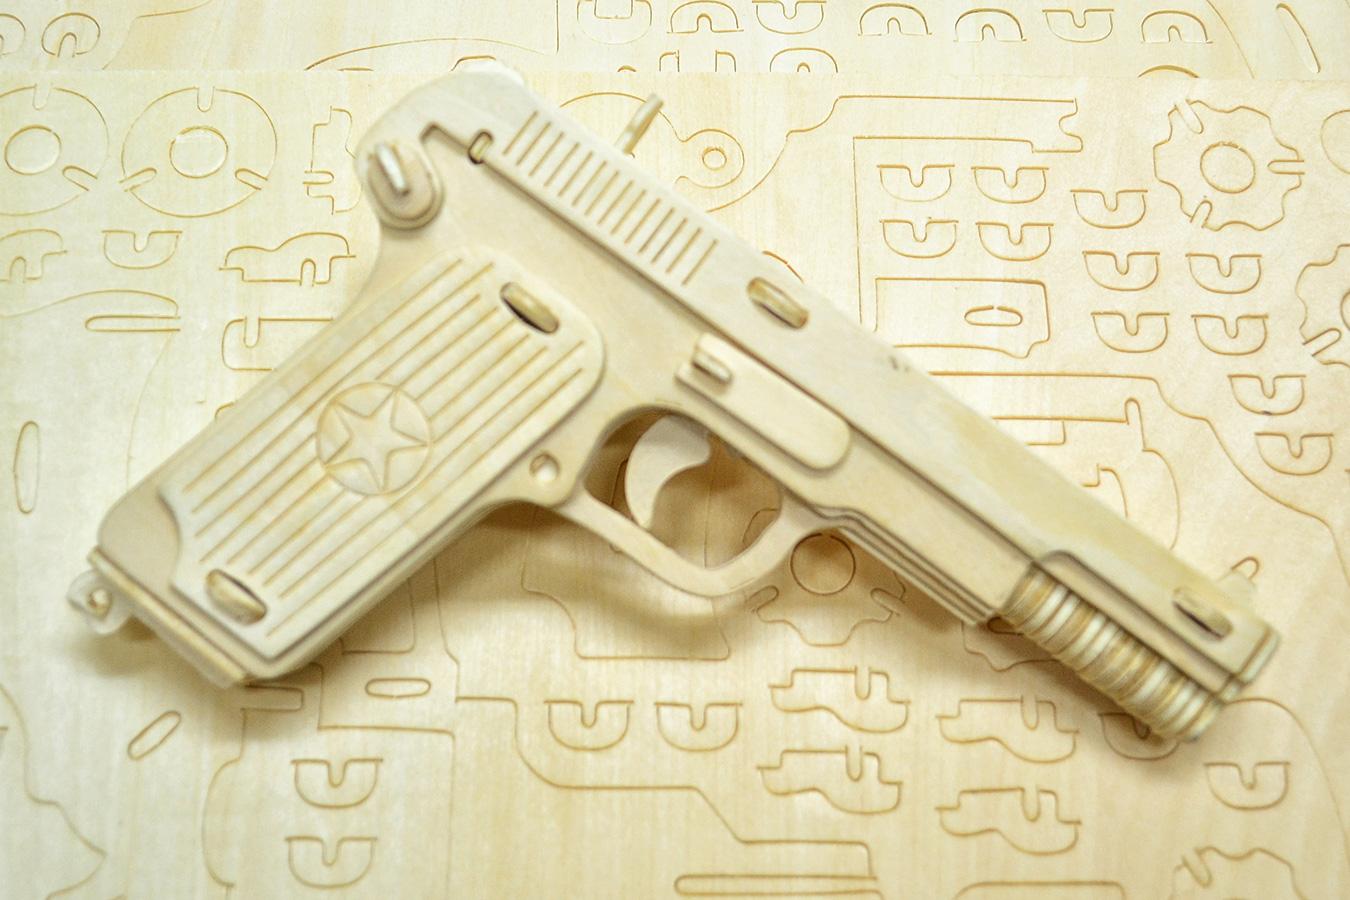 Пистолет Токарева ТТ изображение 0